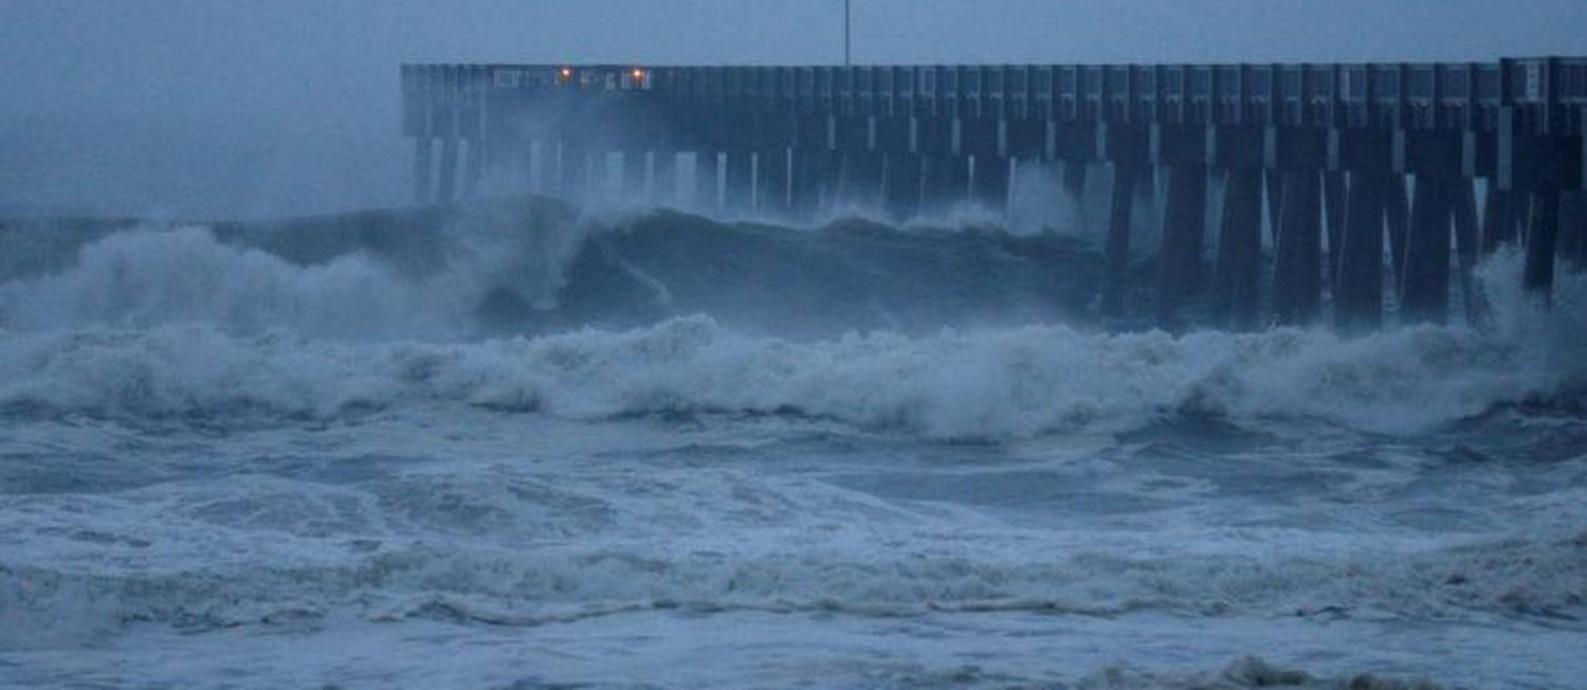 O furacão Michael chega a Panama City, no Noroeste da Flórida Foto: Jonathan Bachman / REUTERS